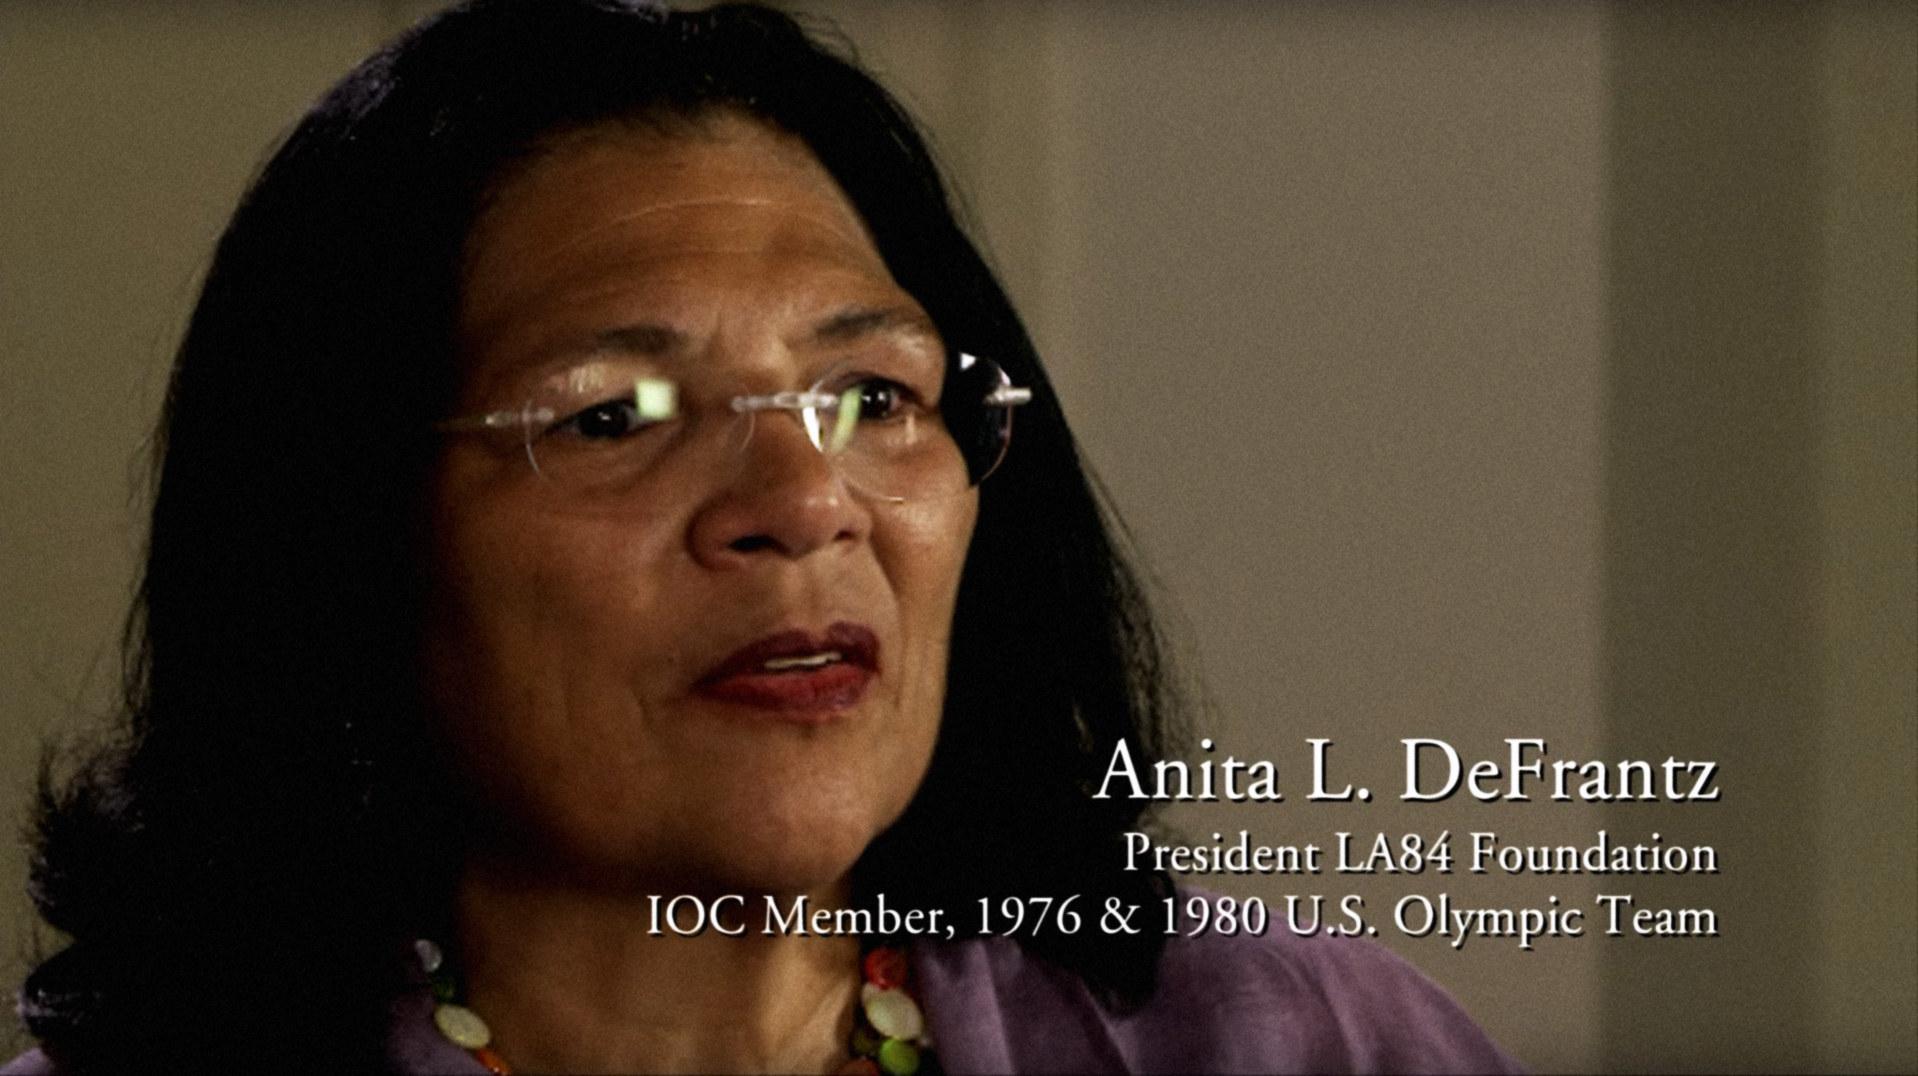 Anita DeFrantz, speaking in 2015